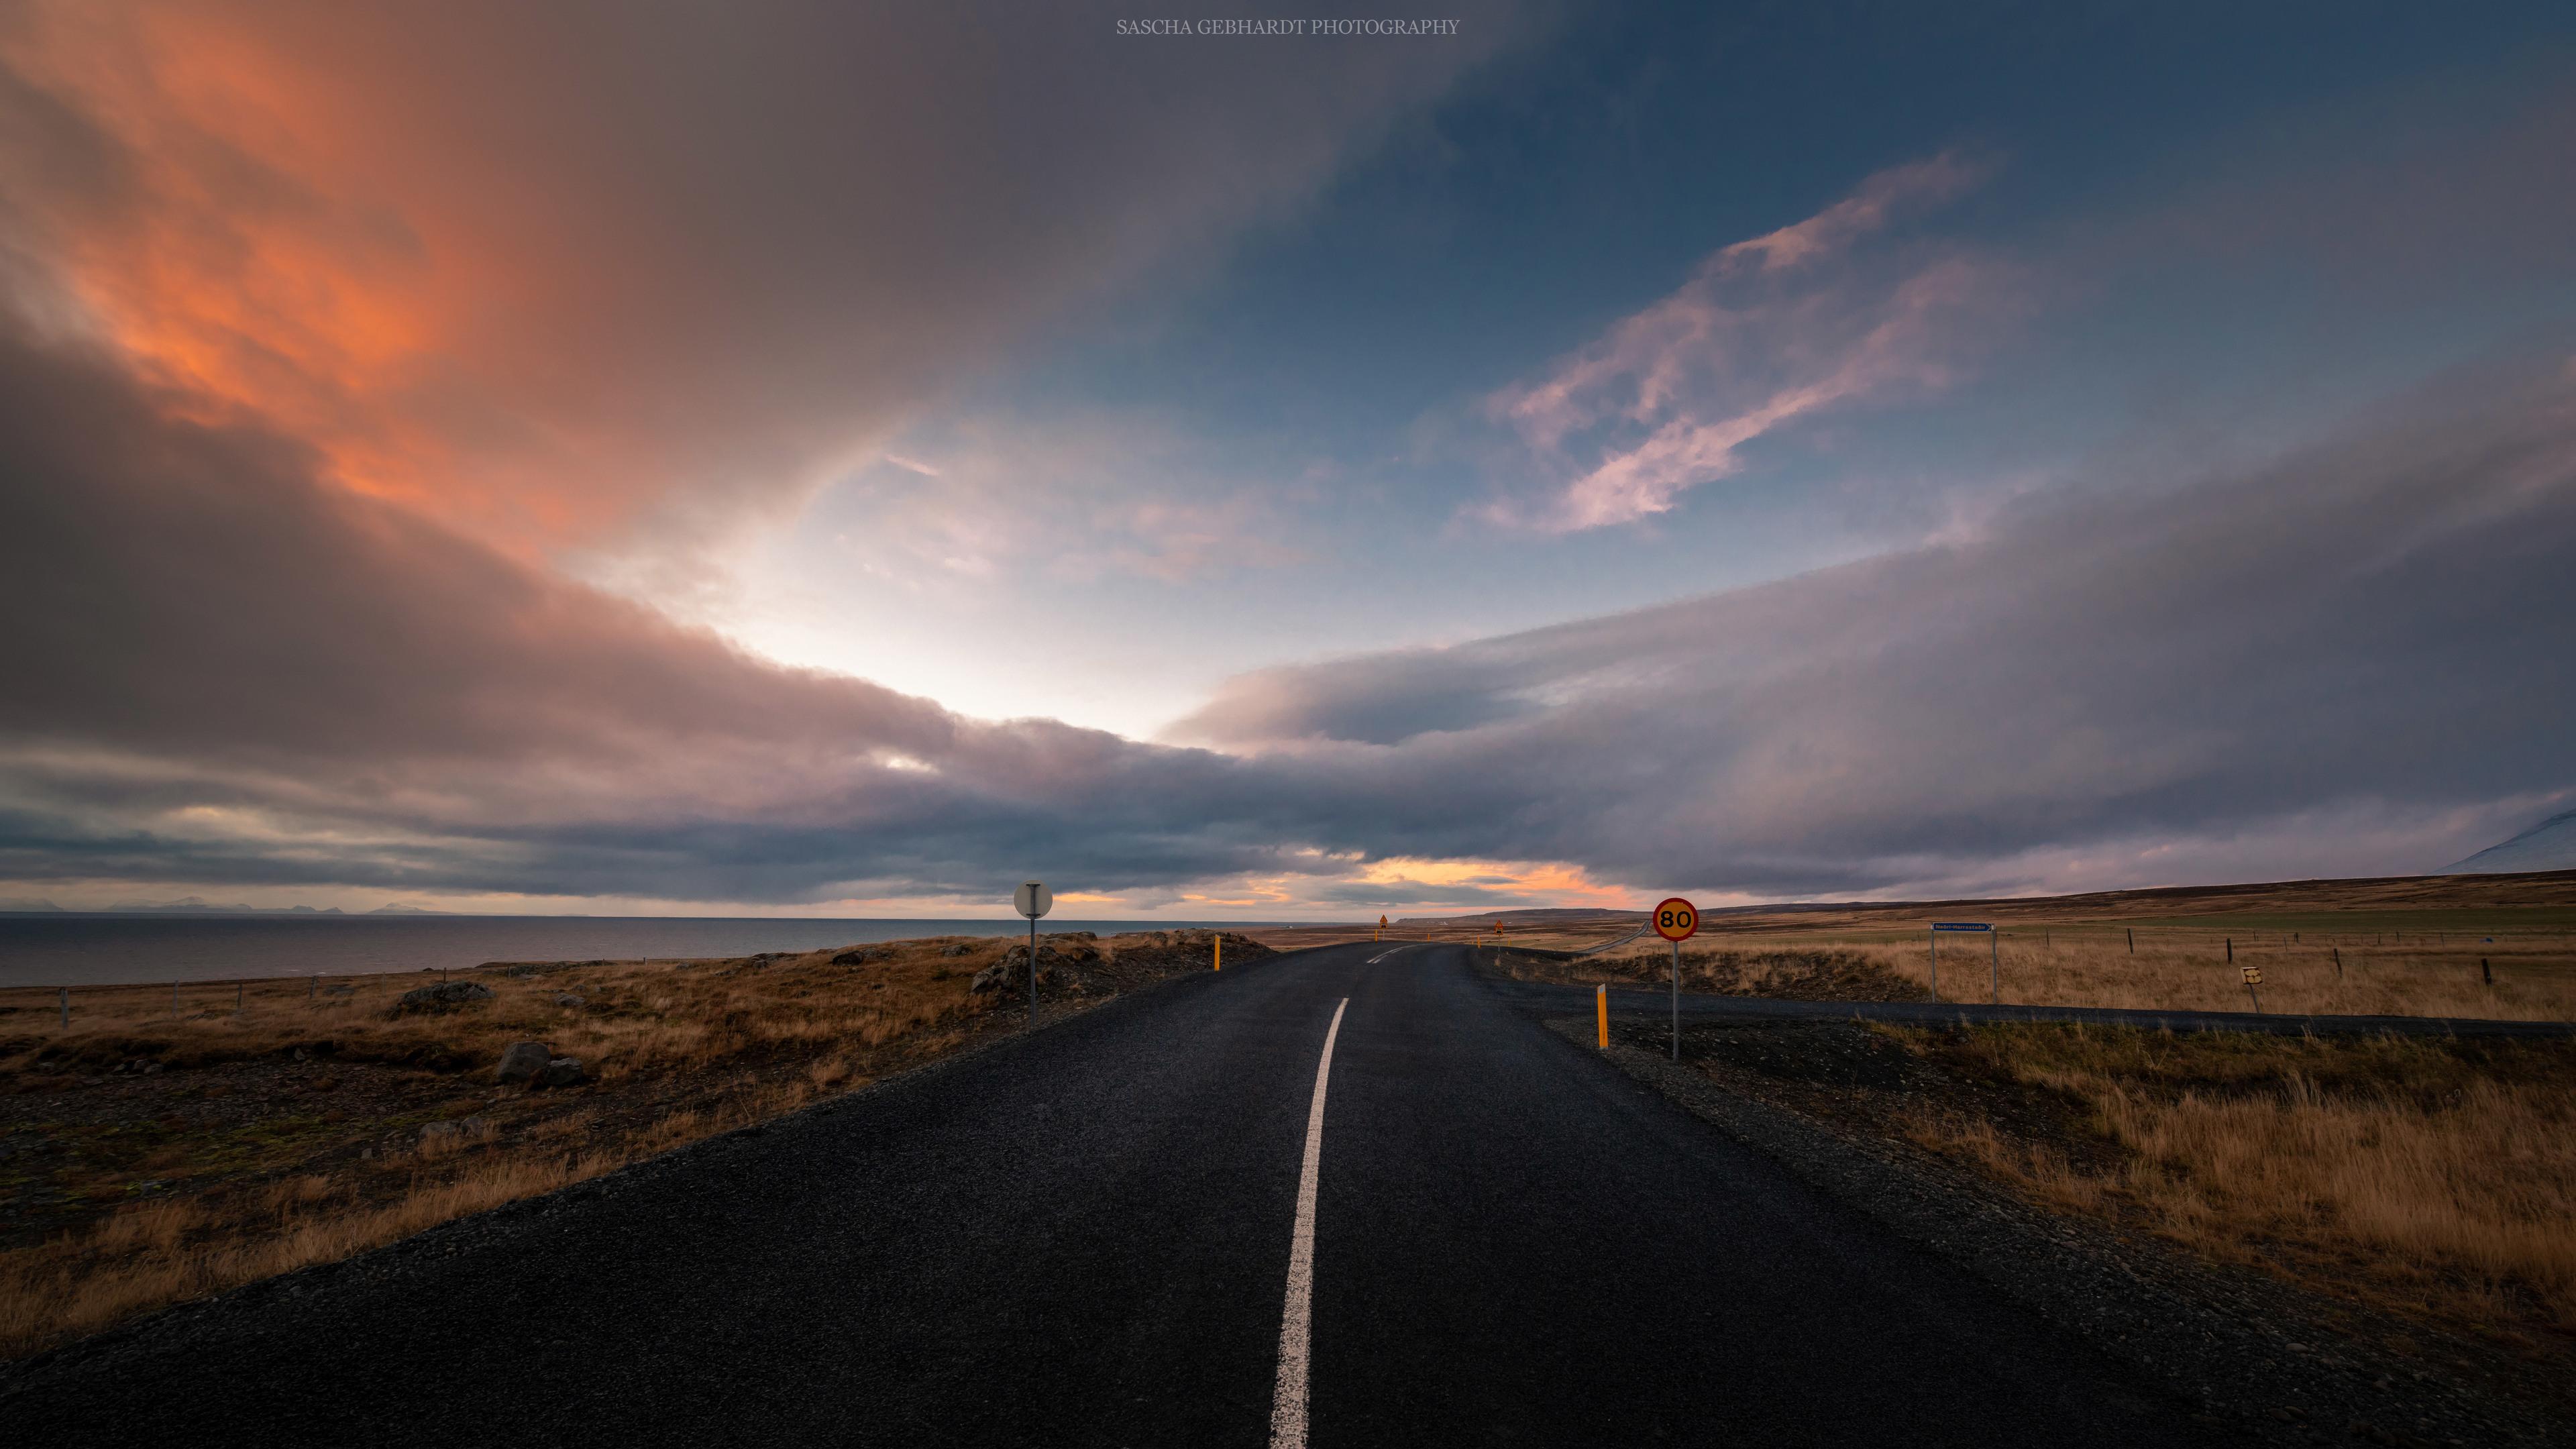 iceland sunset 4k 1551644095 - Iceland Sunset 4k - sunset wallpapers, nature wallpapers, iceland wallpapers, hd-wallpapers, 8k wallpapers, 4k-wallpapers